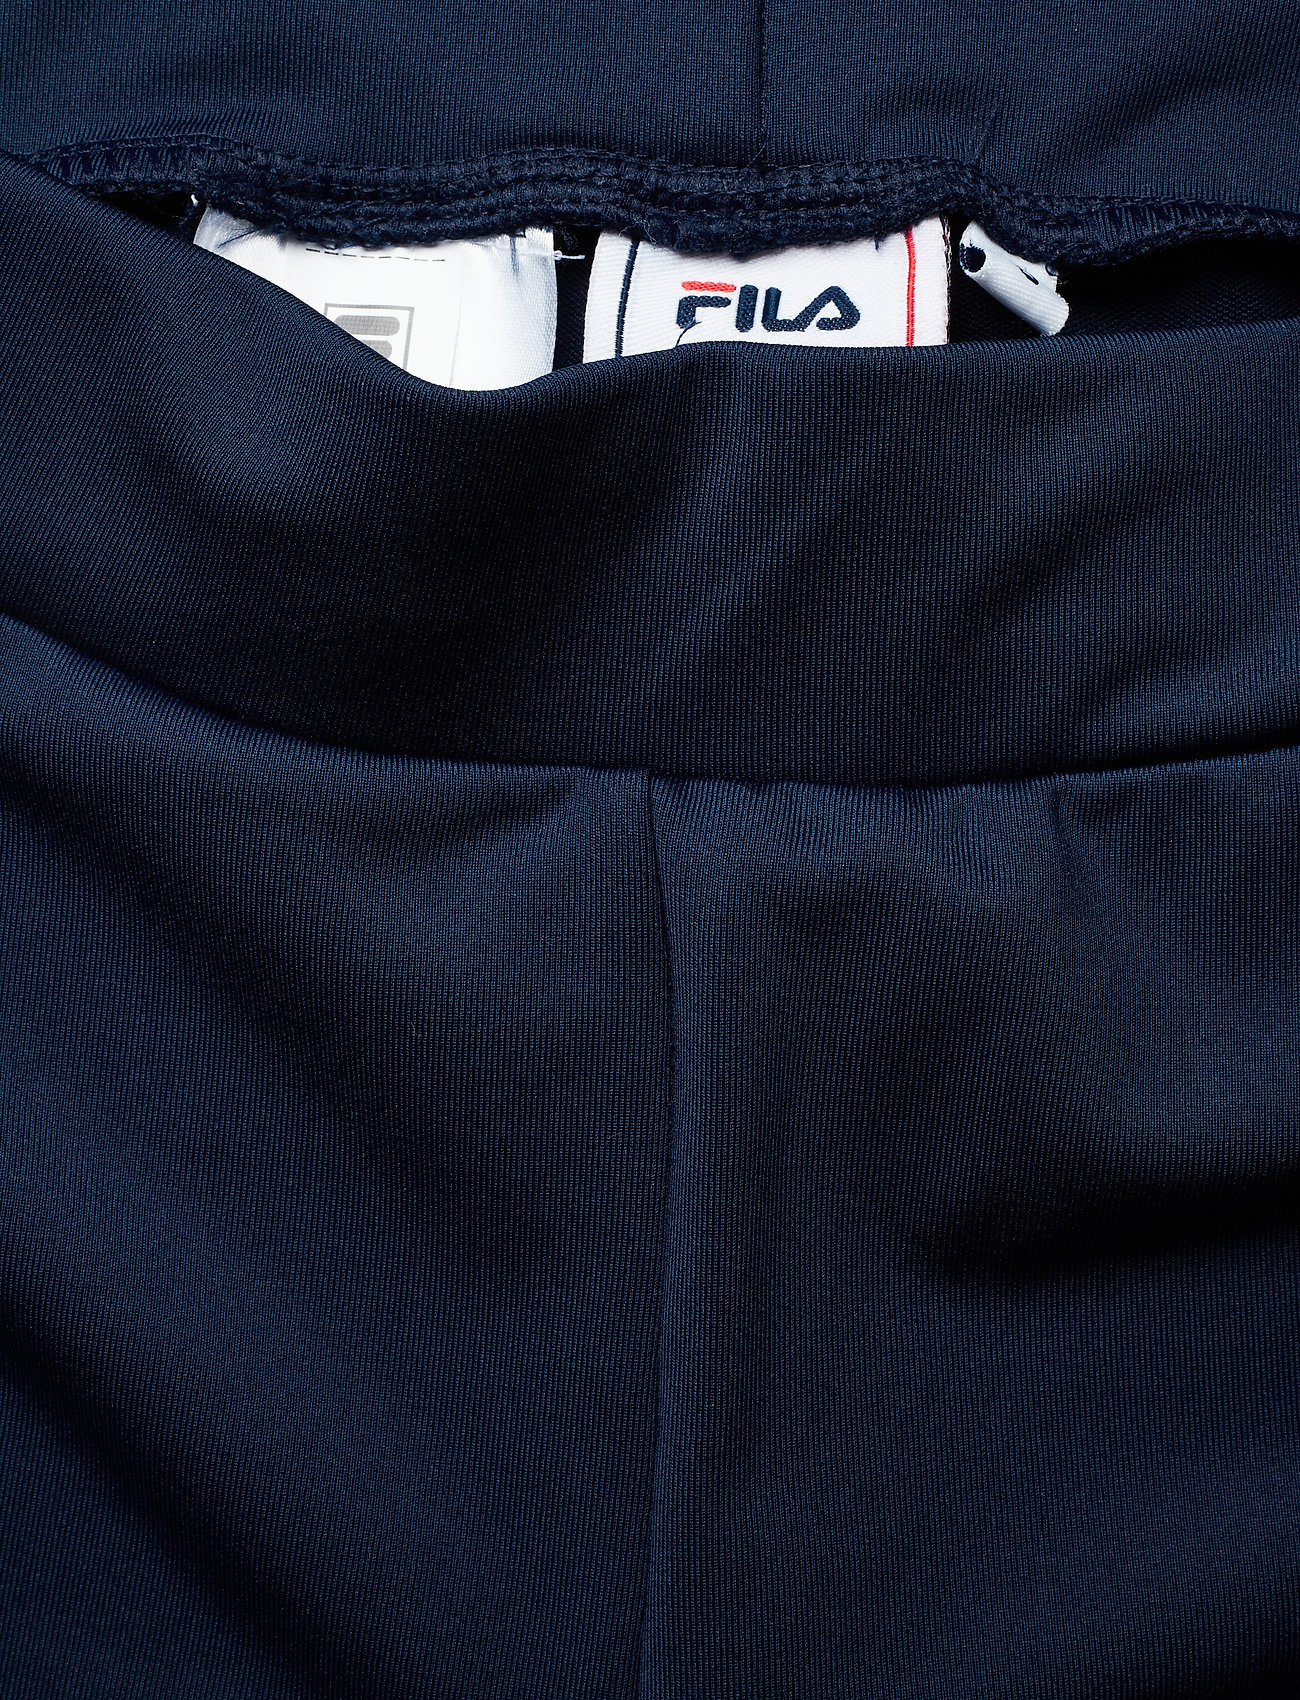 Women Ballari Leggings (Black Iris-bright White) (337.50 kr) - FILA